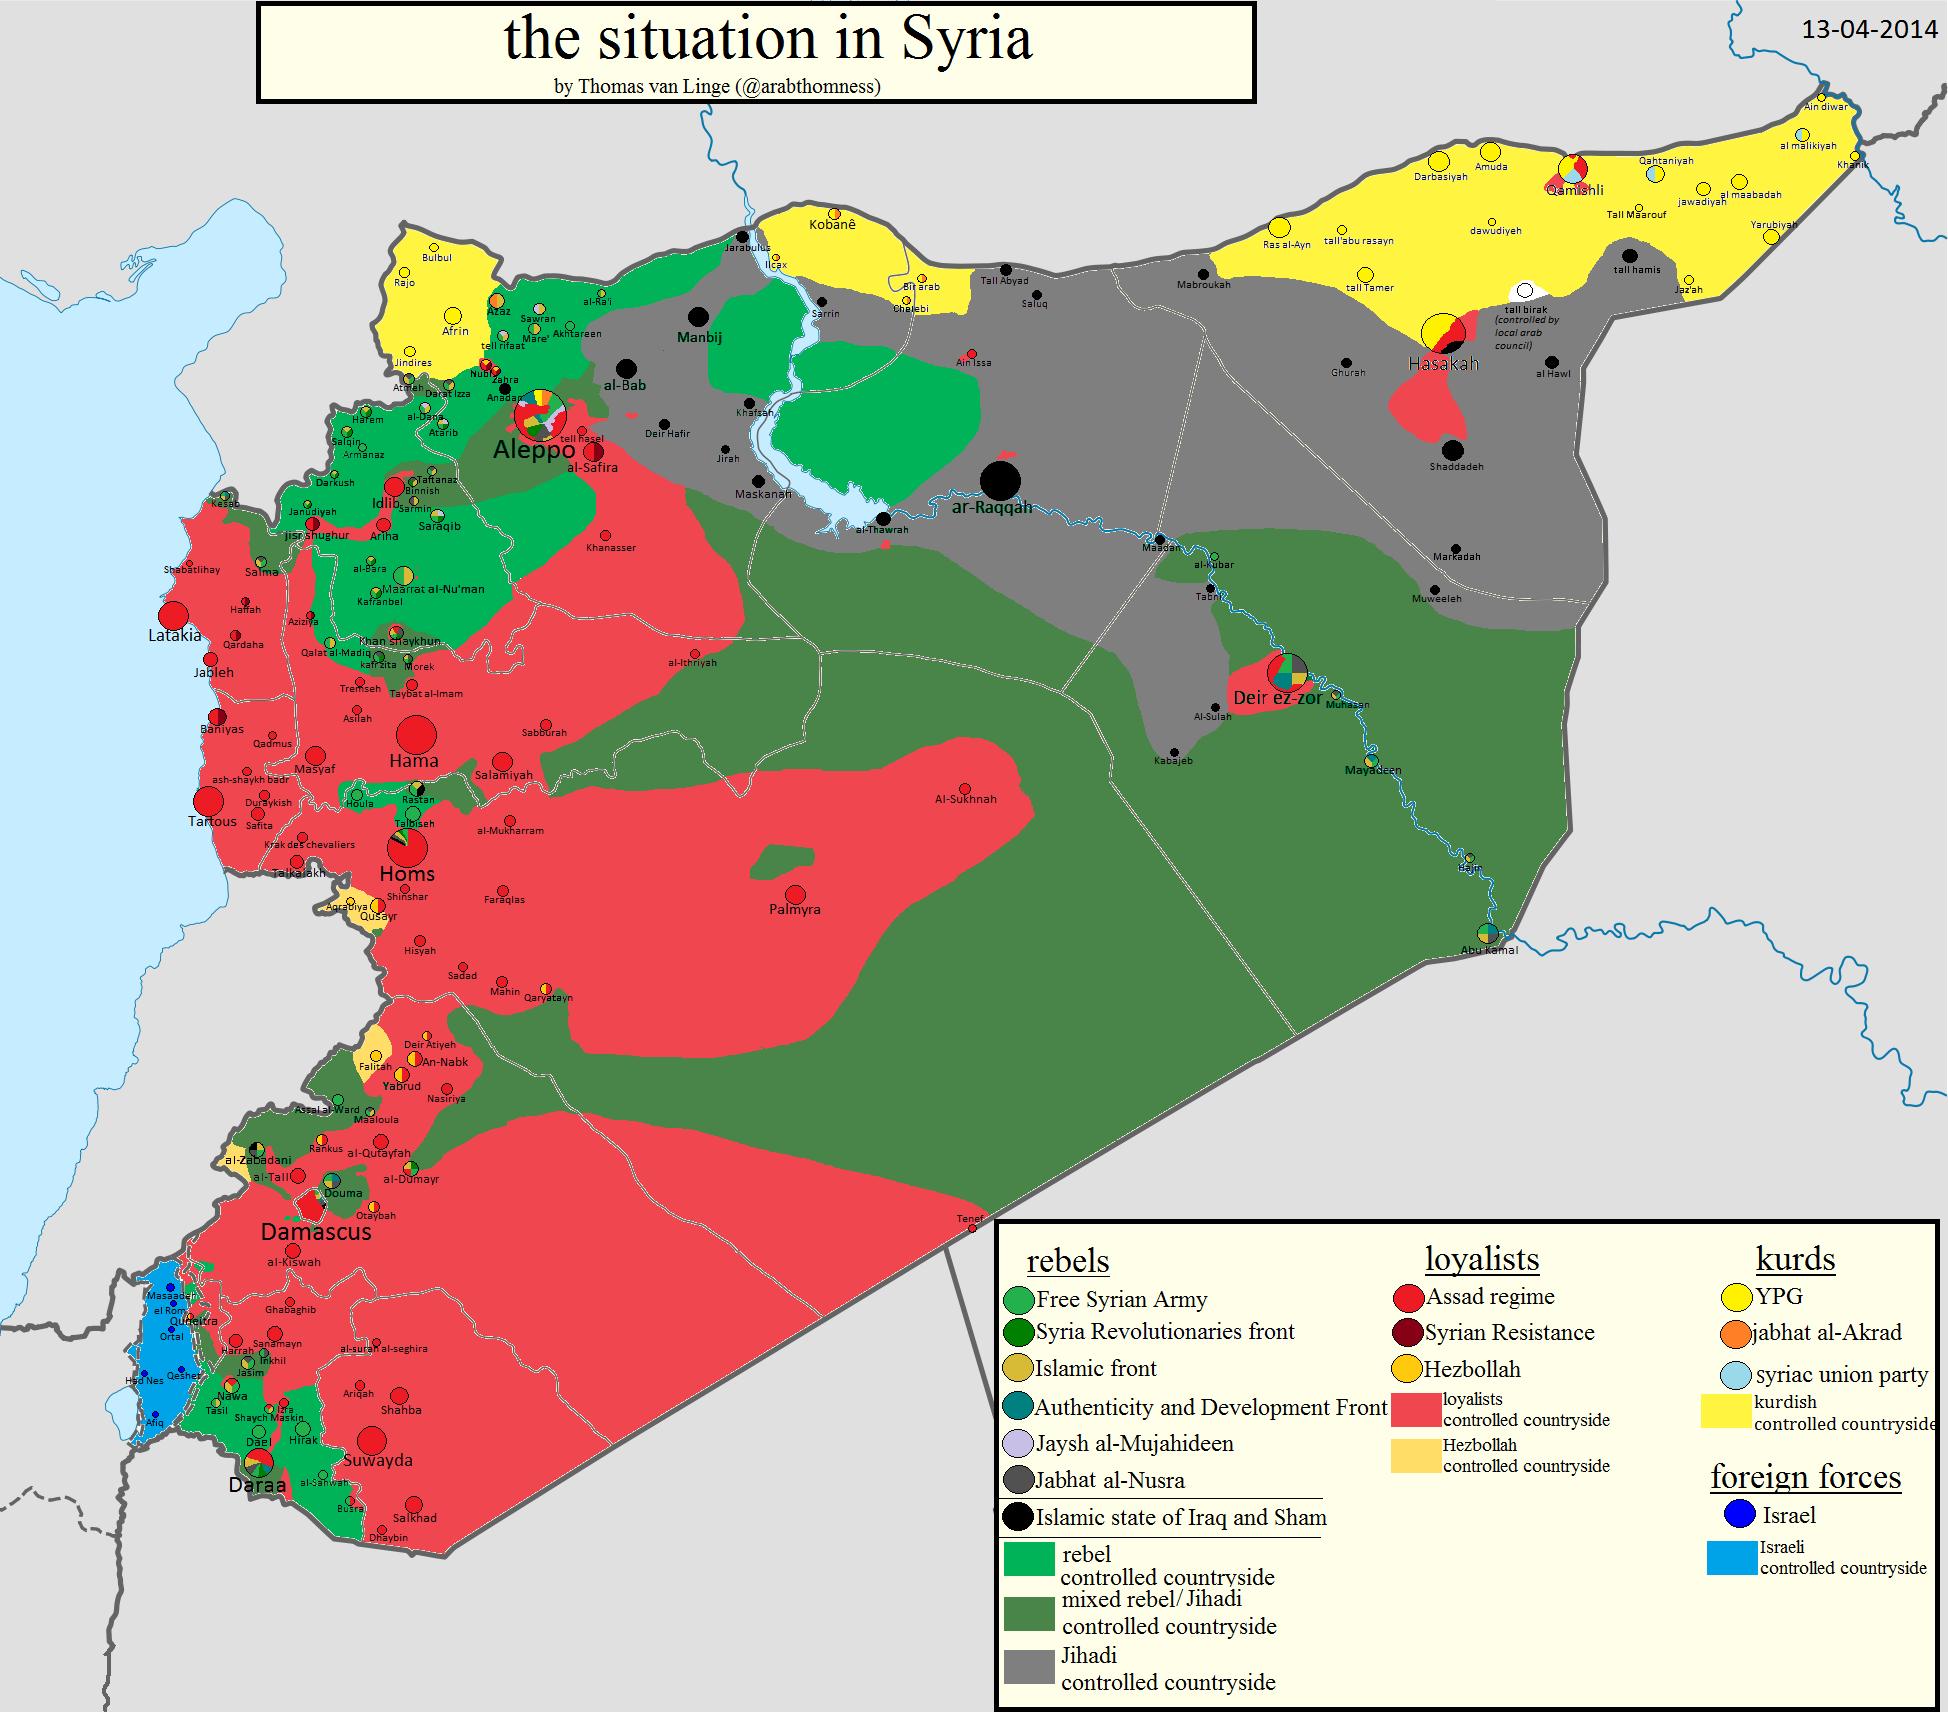 http://www.les-crises.fr/wp-content/uploads/2015/10/22-syrie-04-2014.png